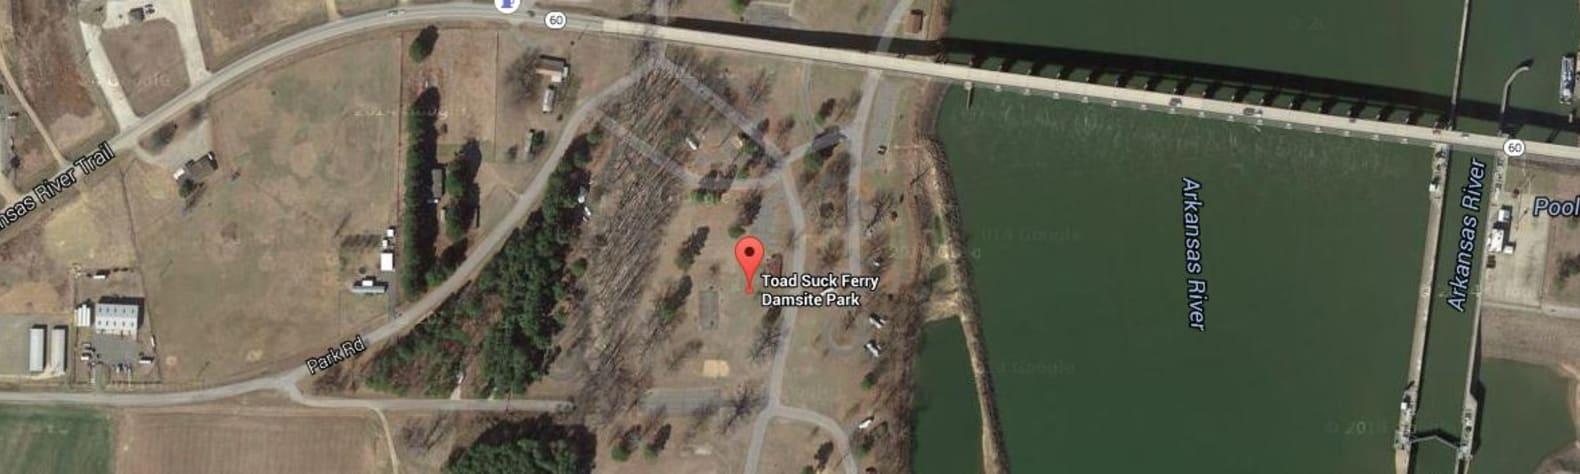 Arkansas River - Toad Suck Ferry Lock and Dam